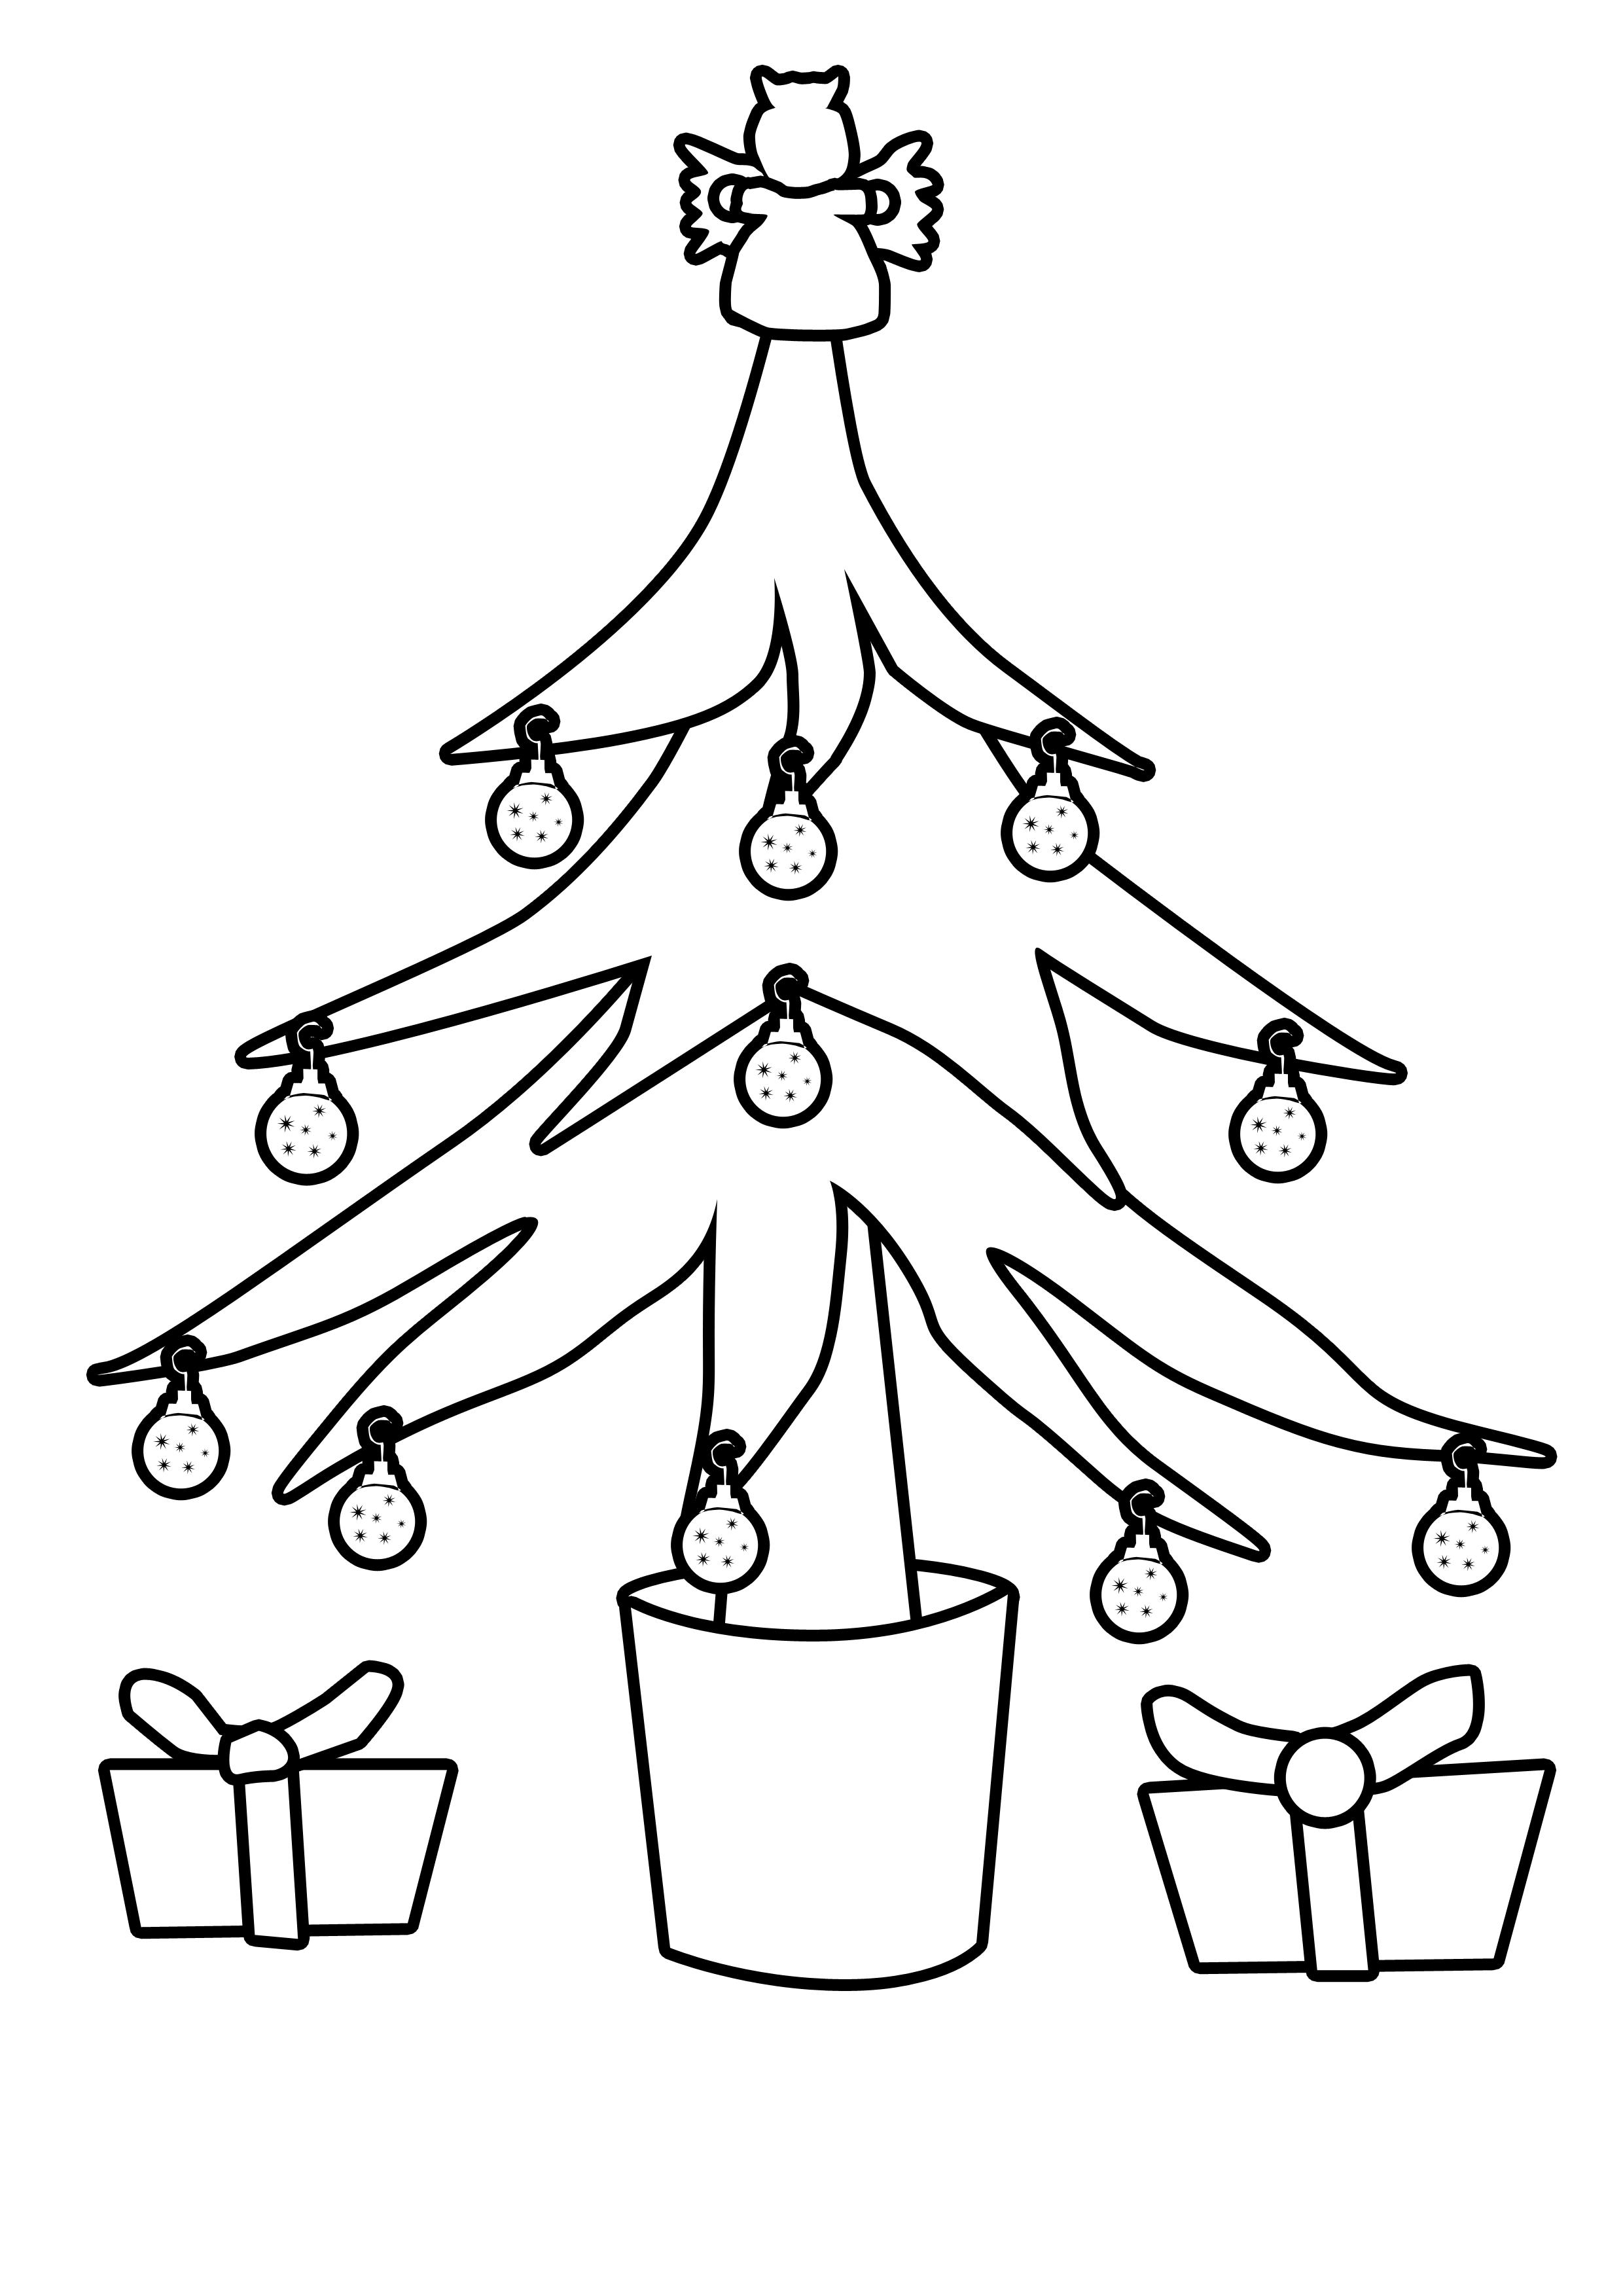 Christmas Tree Outline Christmas Tree Outline for